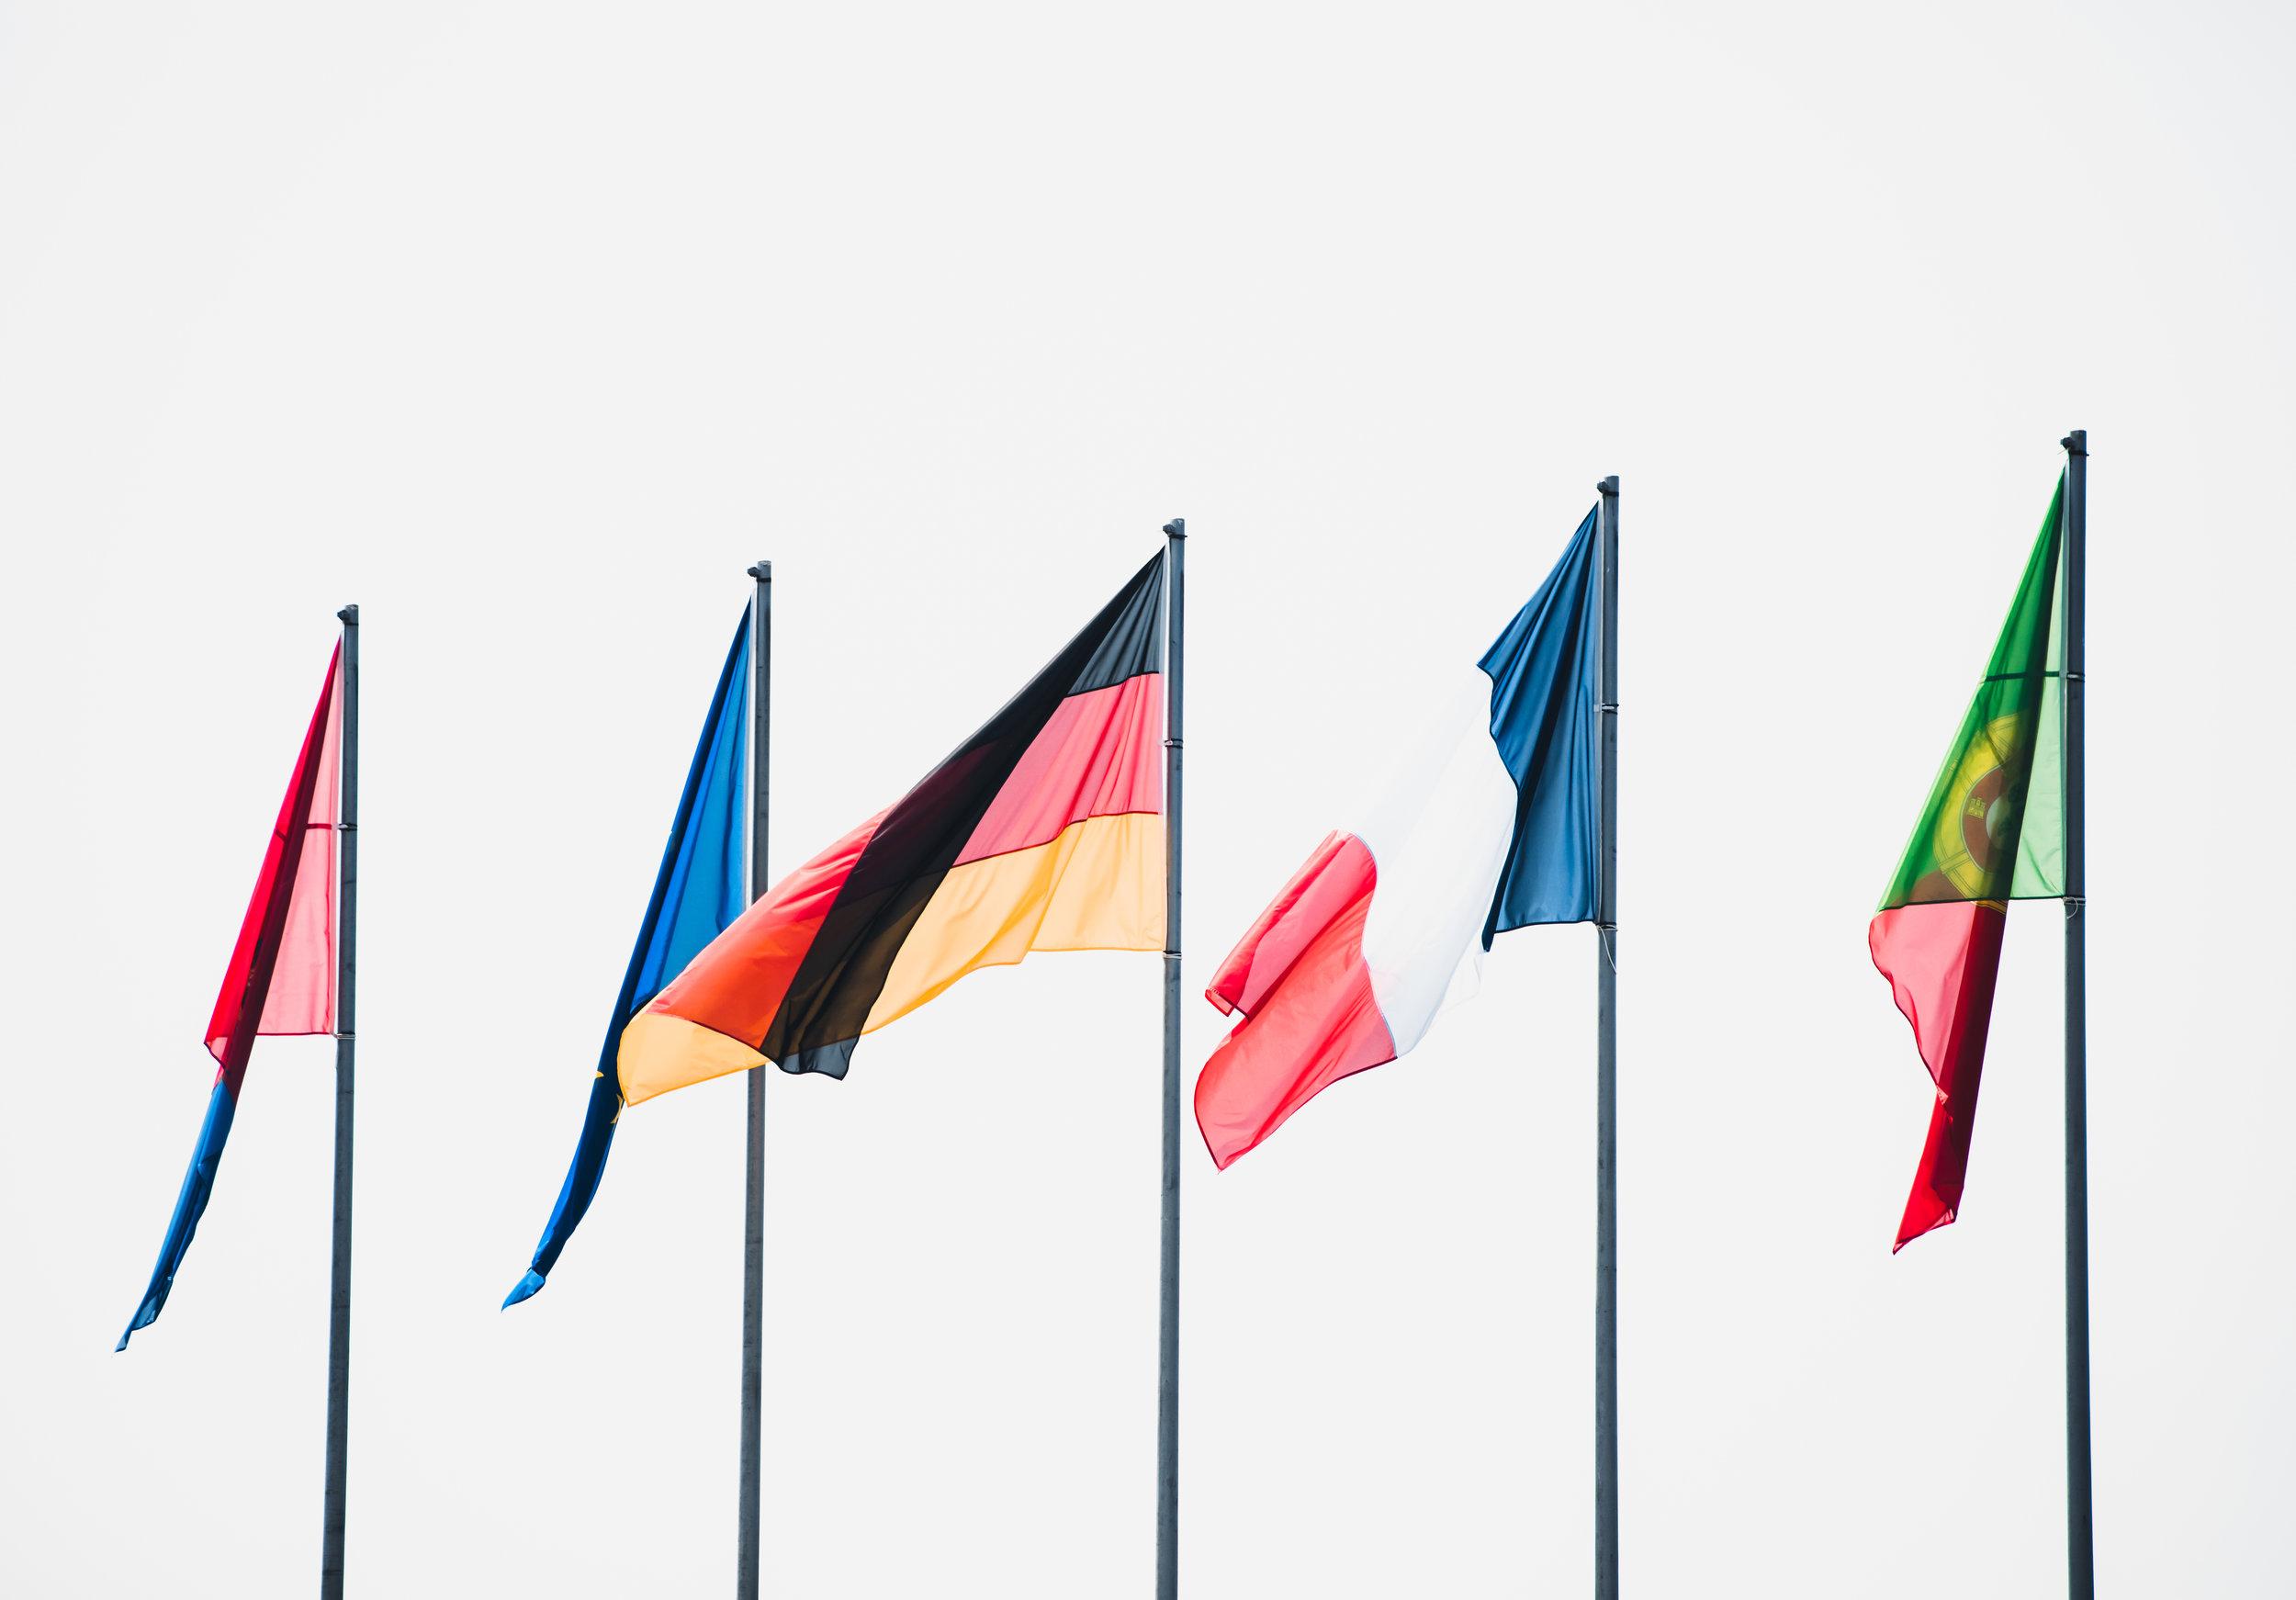 INTERNATIONAL BUSINESS - Our International business practice includes advising clients regarding international trade, global e-commerce, international joint ventures, international arbitration and litigation, and other international business issues.